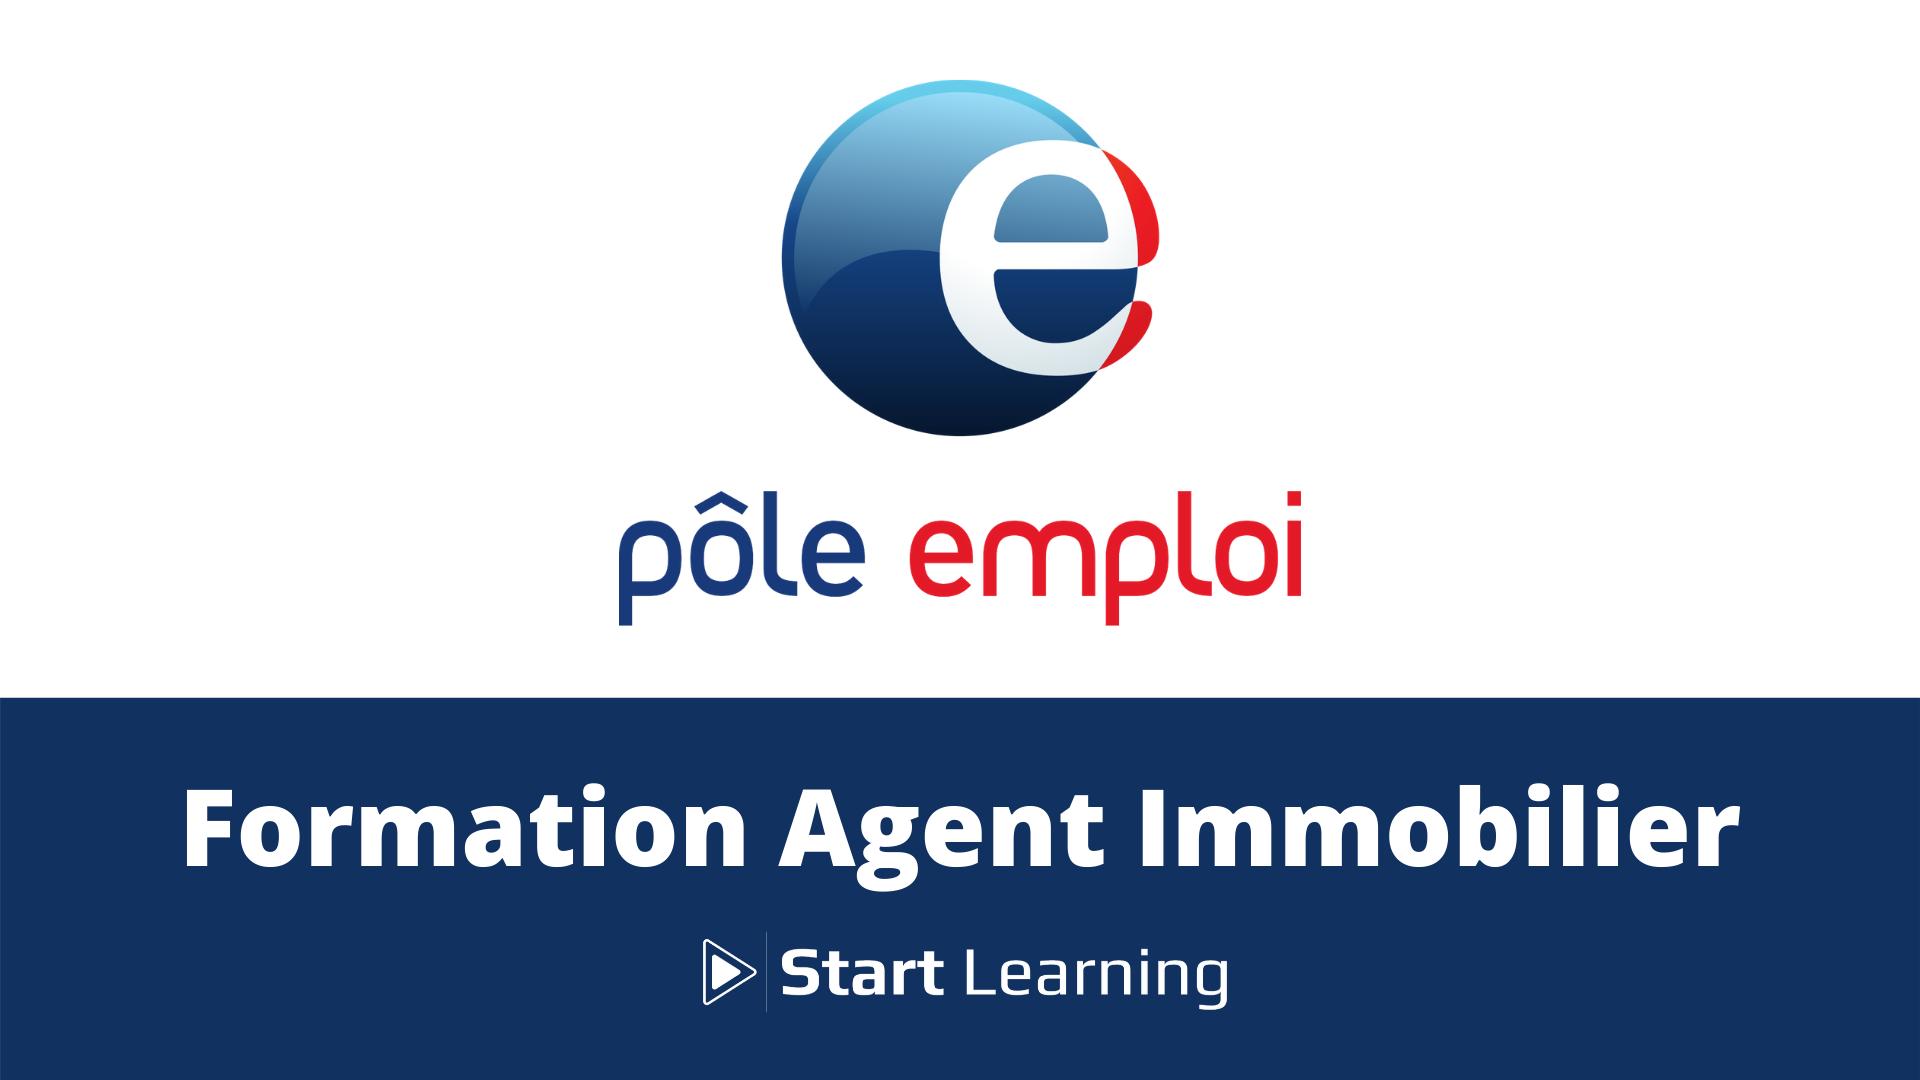 Formation Agent Immobilier Pôle Emploi